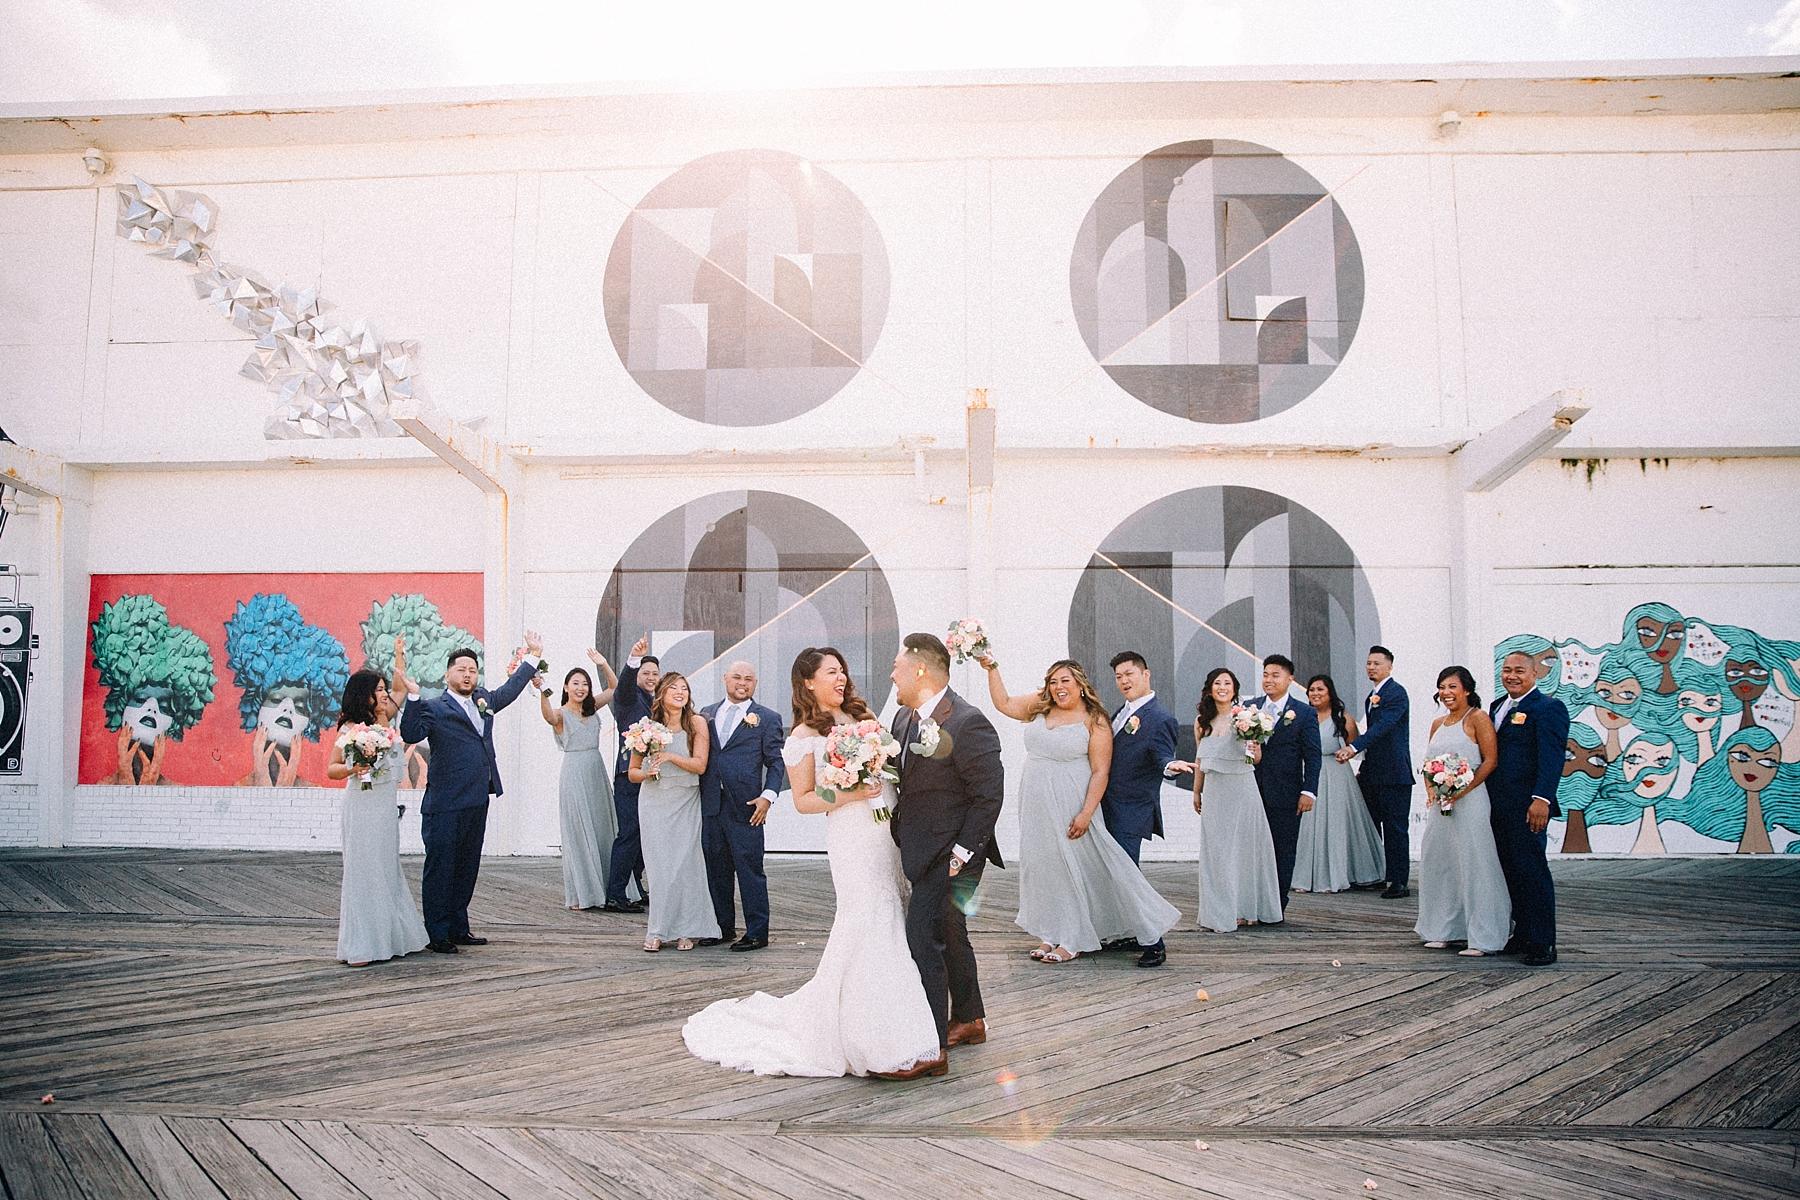 new_jersey_wedding_the_Berkeley_beach_asbury_photographer_0038.jpg